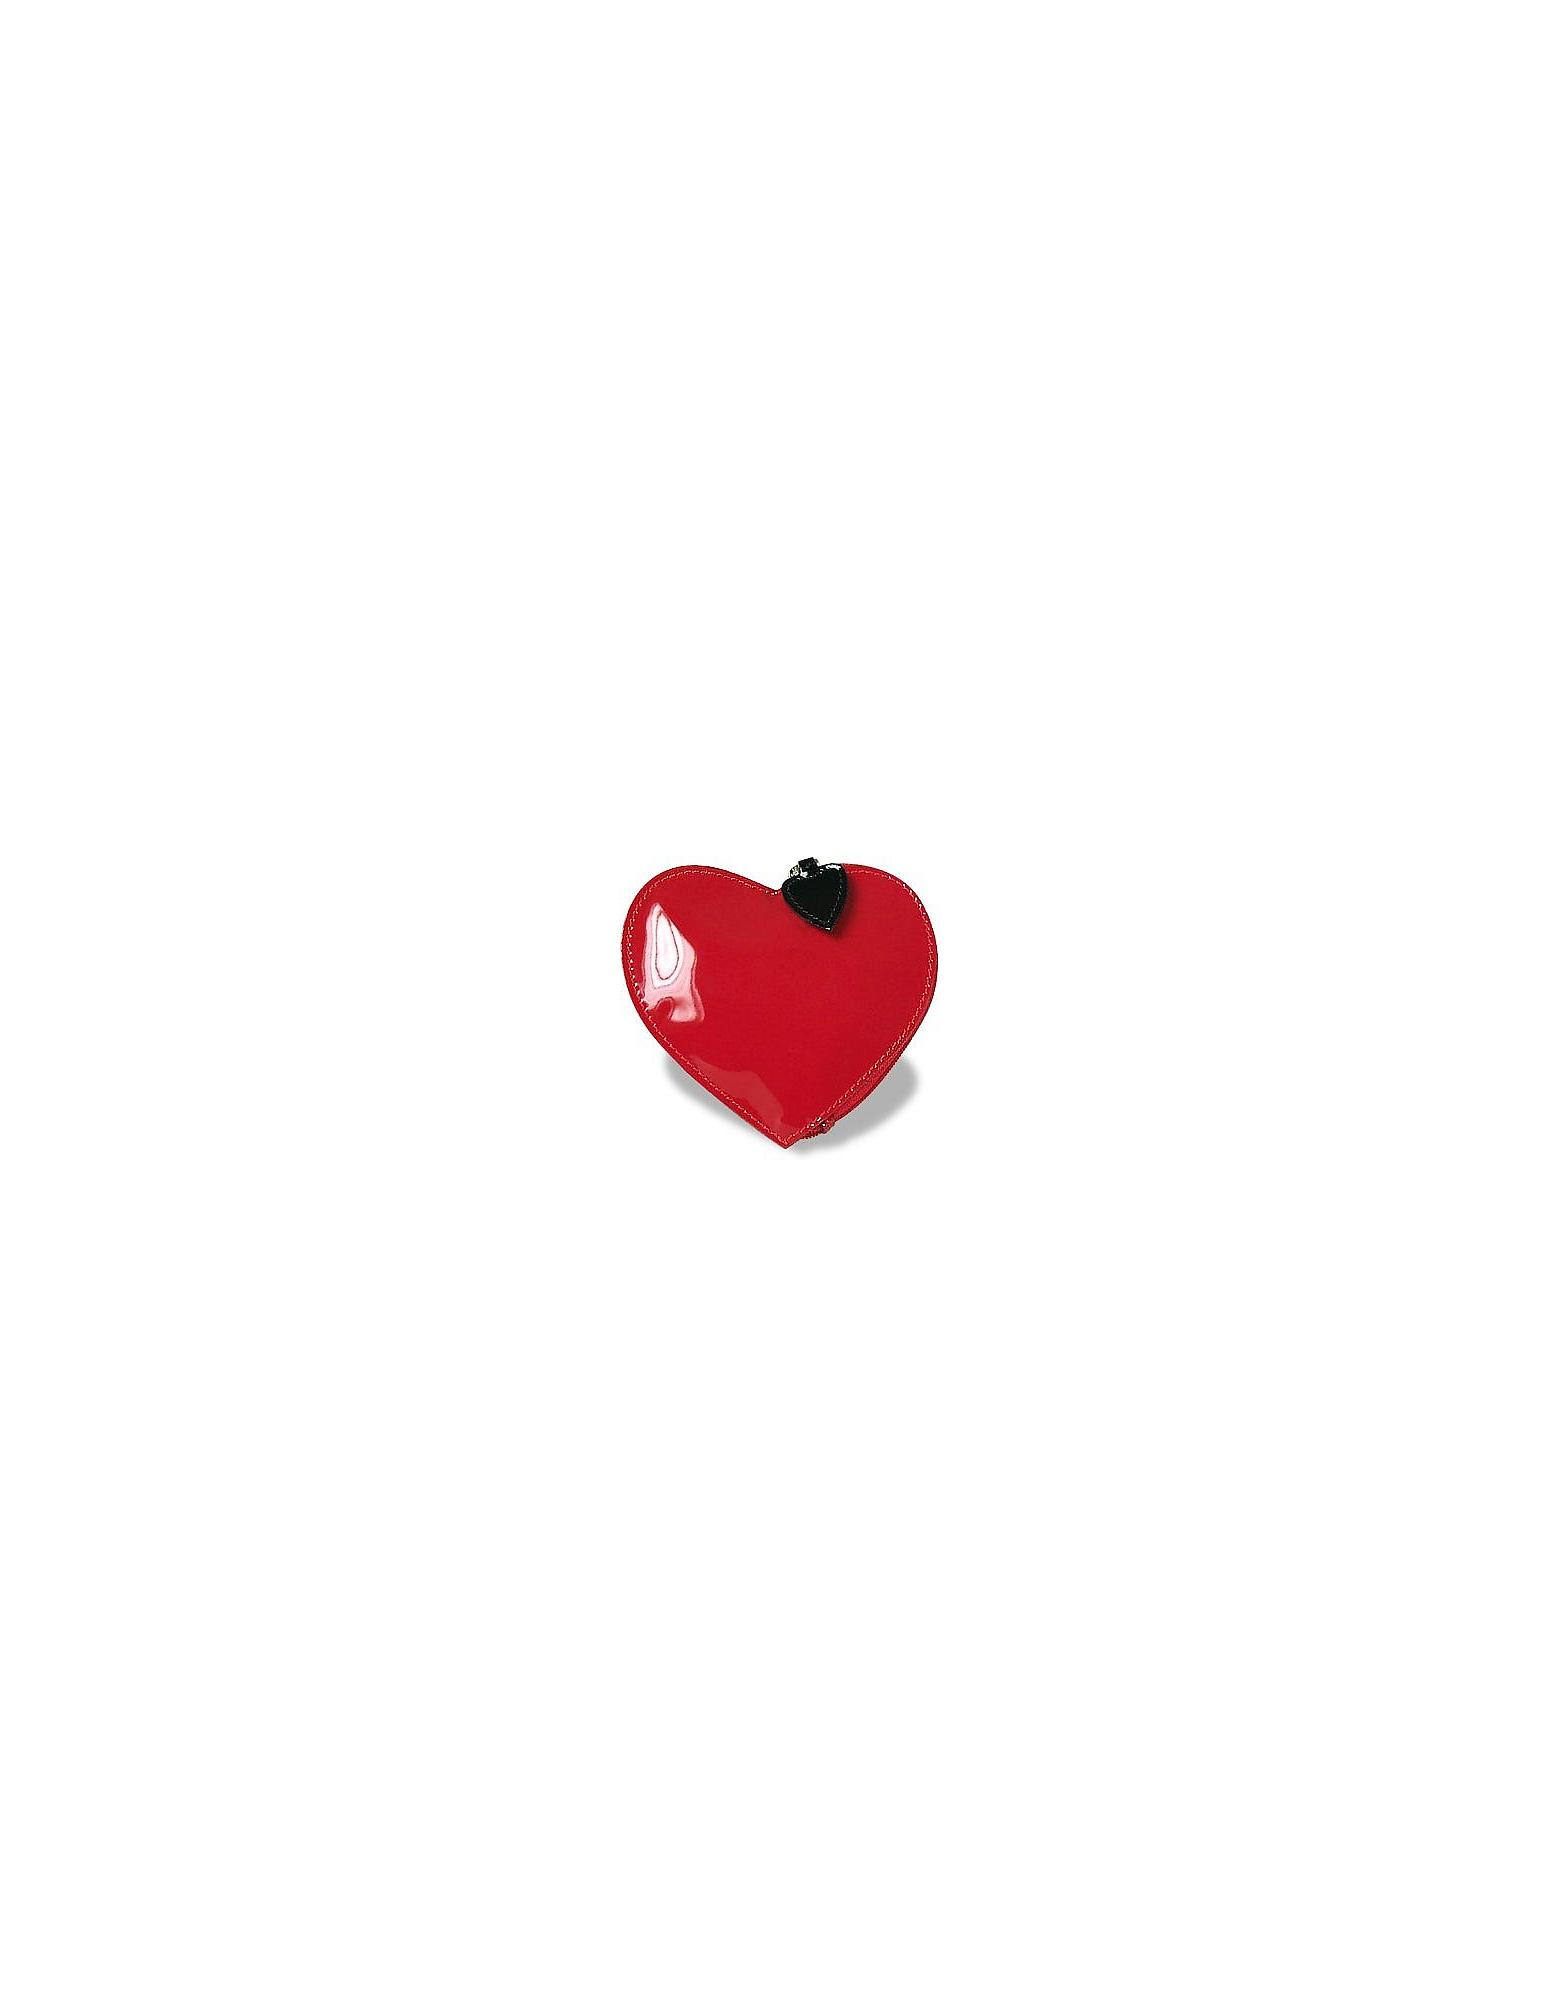 Fontanelli Wallets, Heart Coin Holder